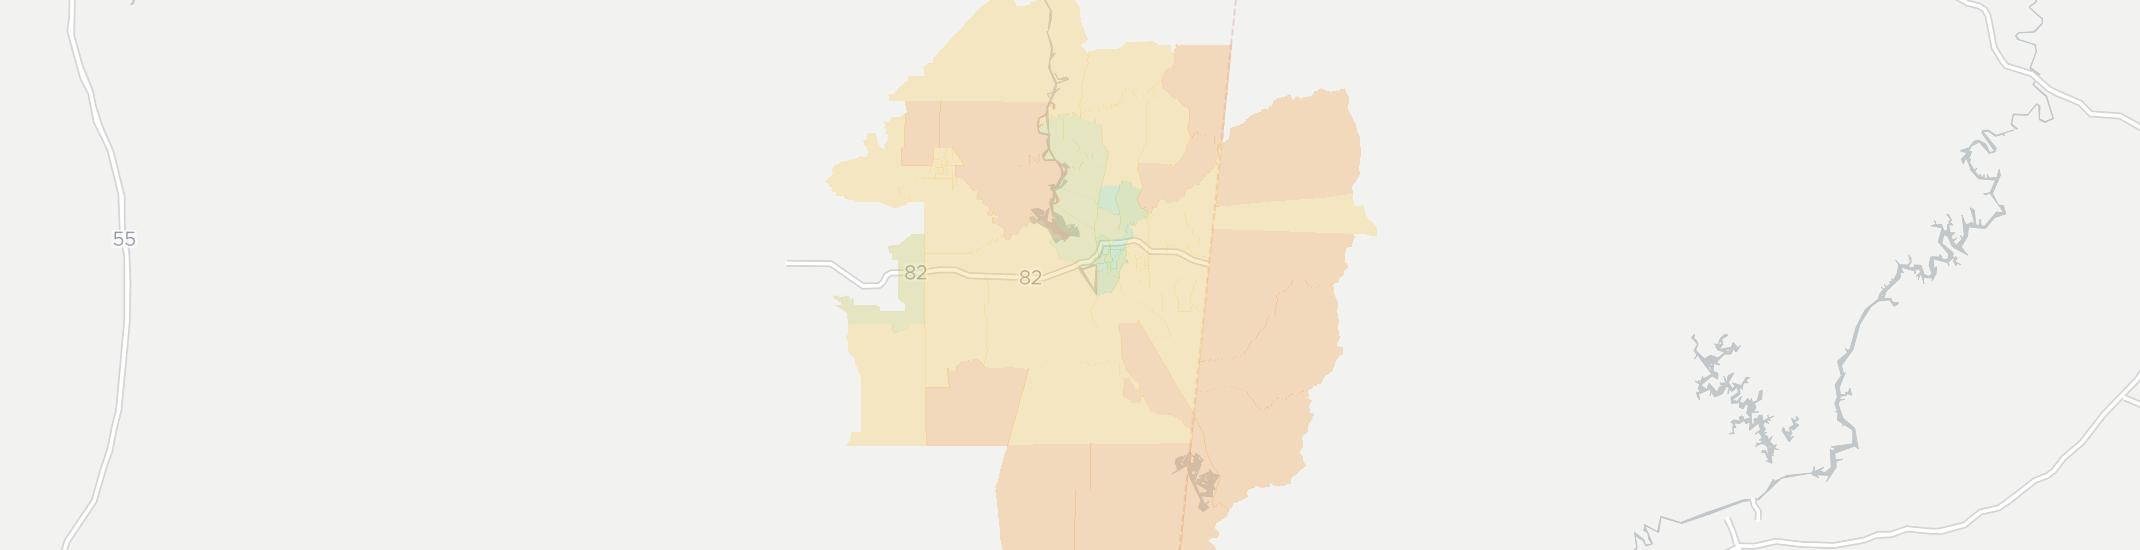 Internet Providers in Columbus, MS: Compare 17 Providers on